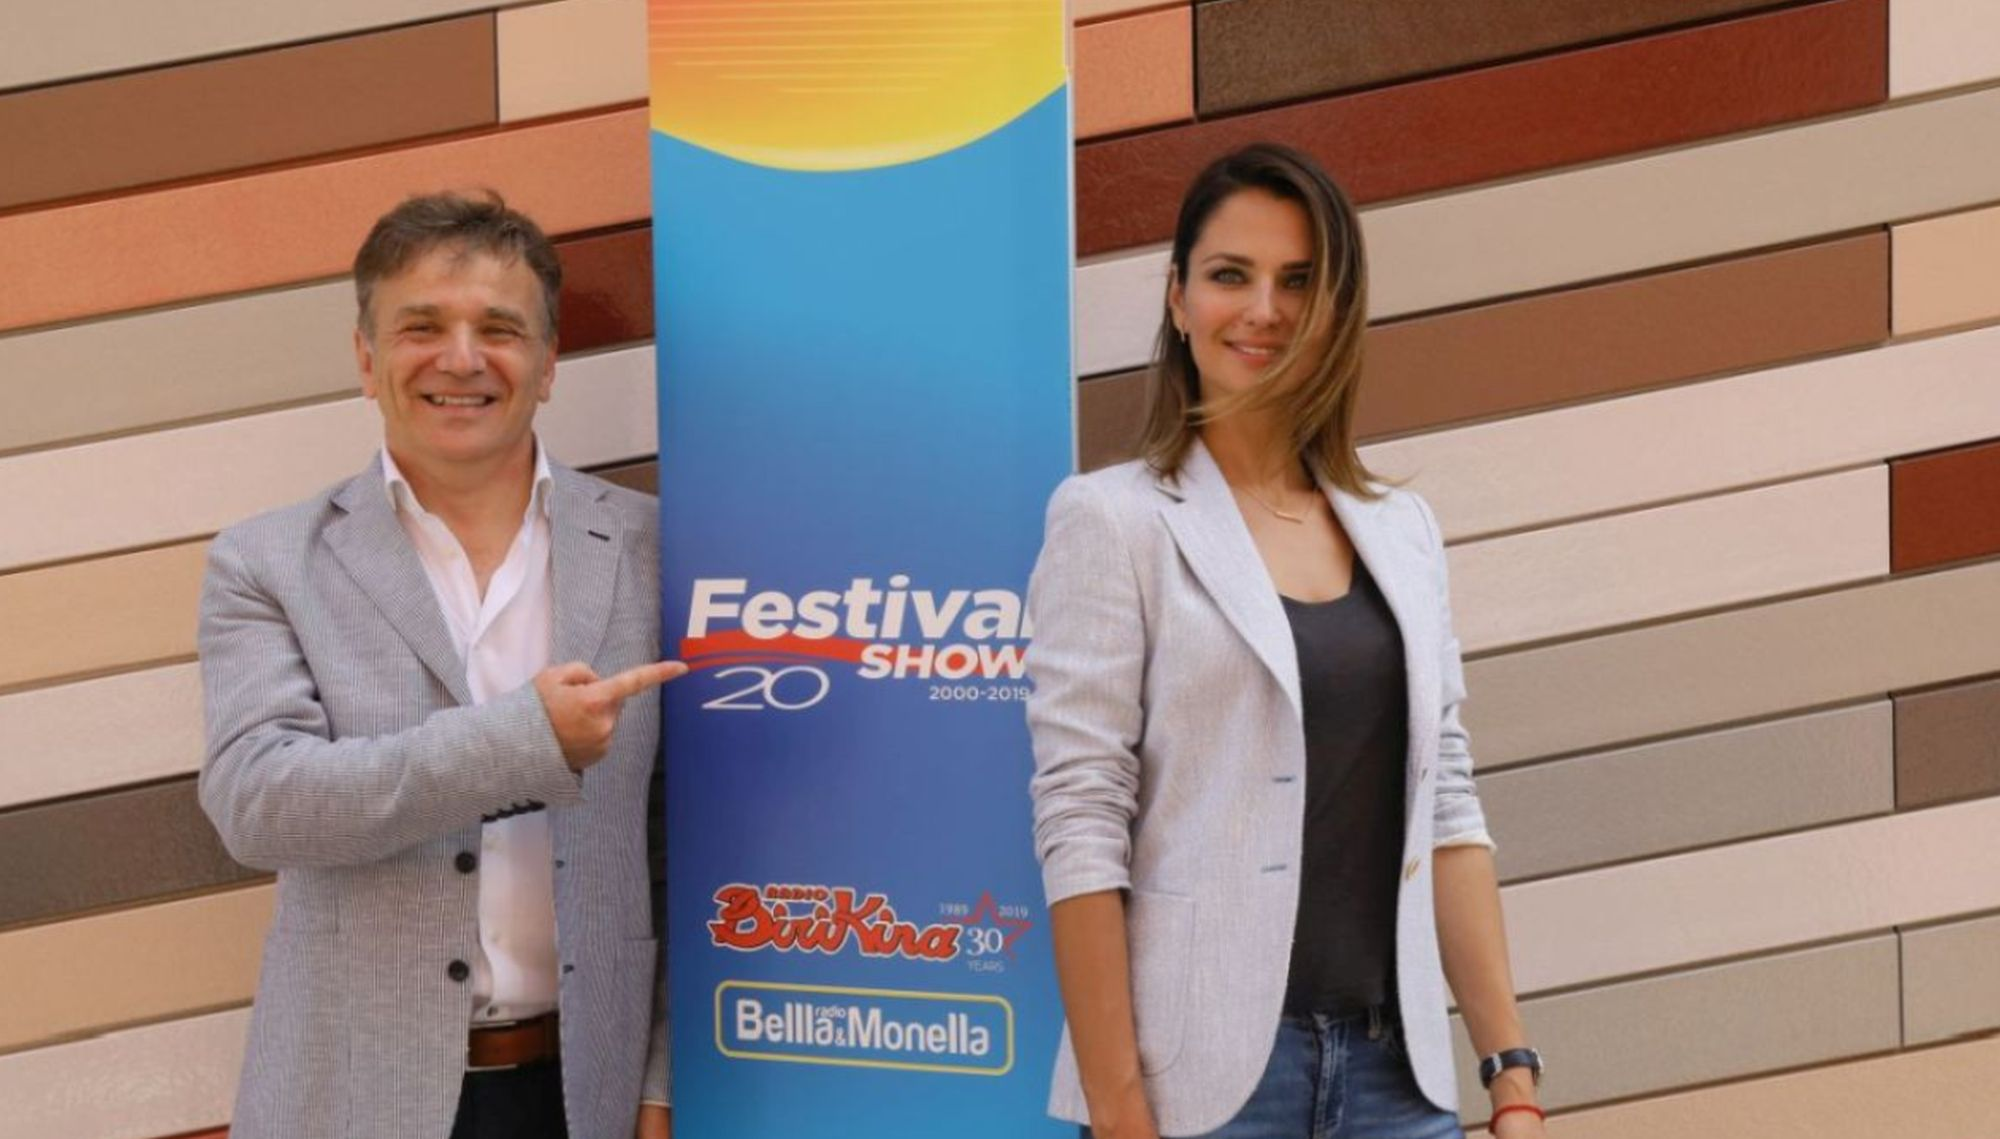 Festival Show 2019: tutti i cantanti